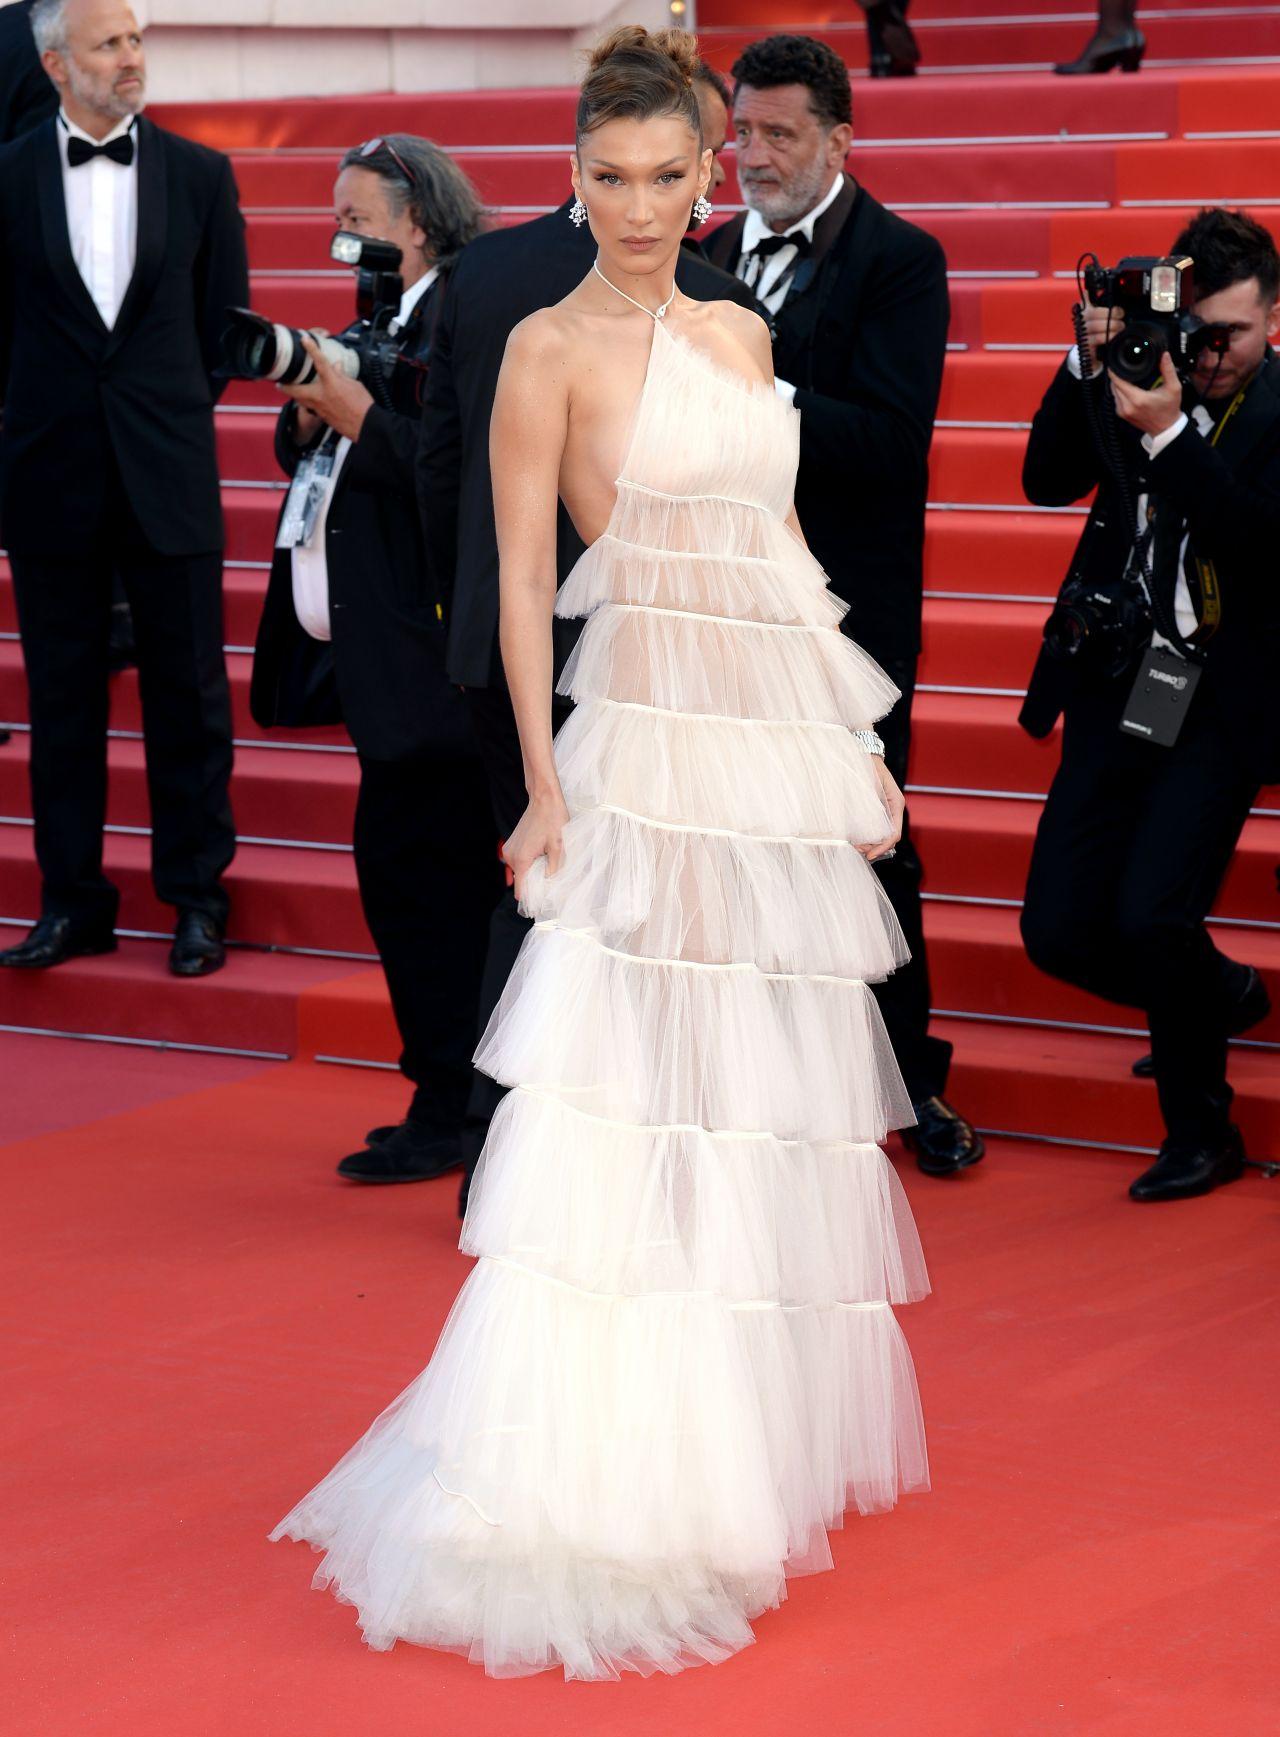 Bella Hadid Rocketman Red Carpet At Cannes Film Festival